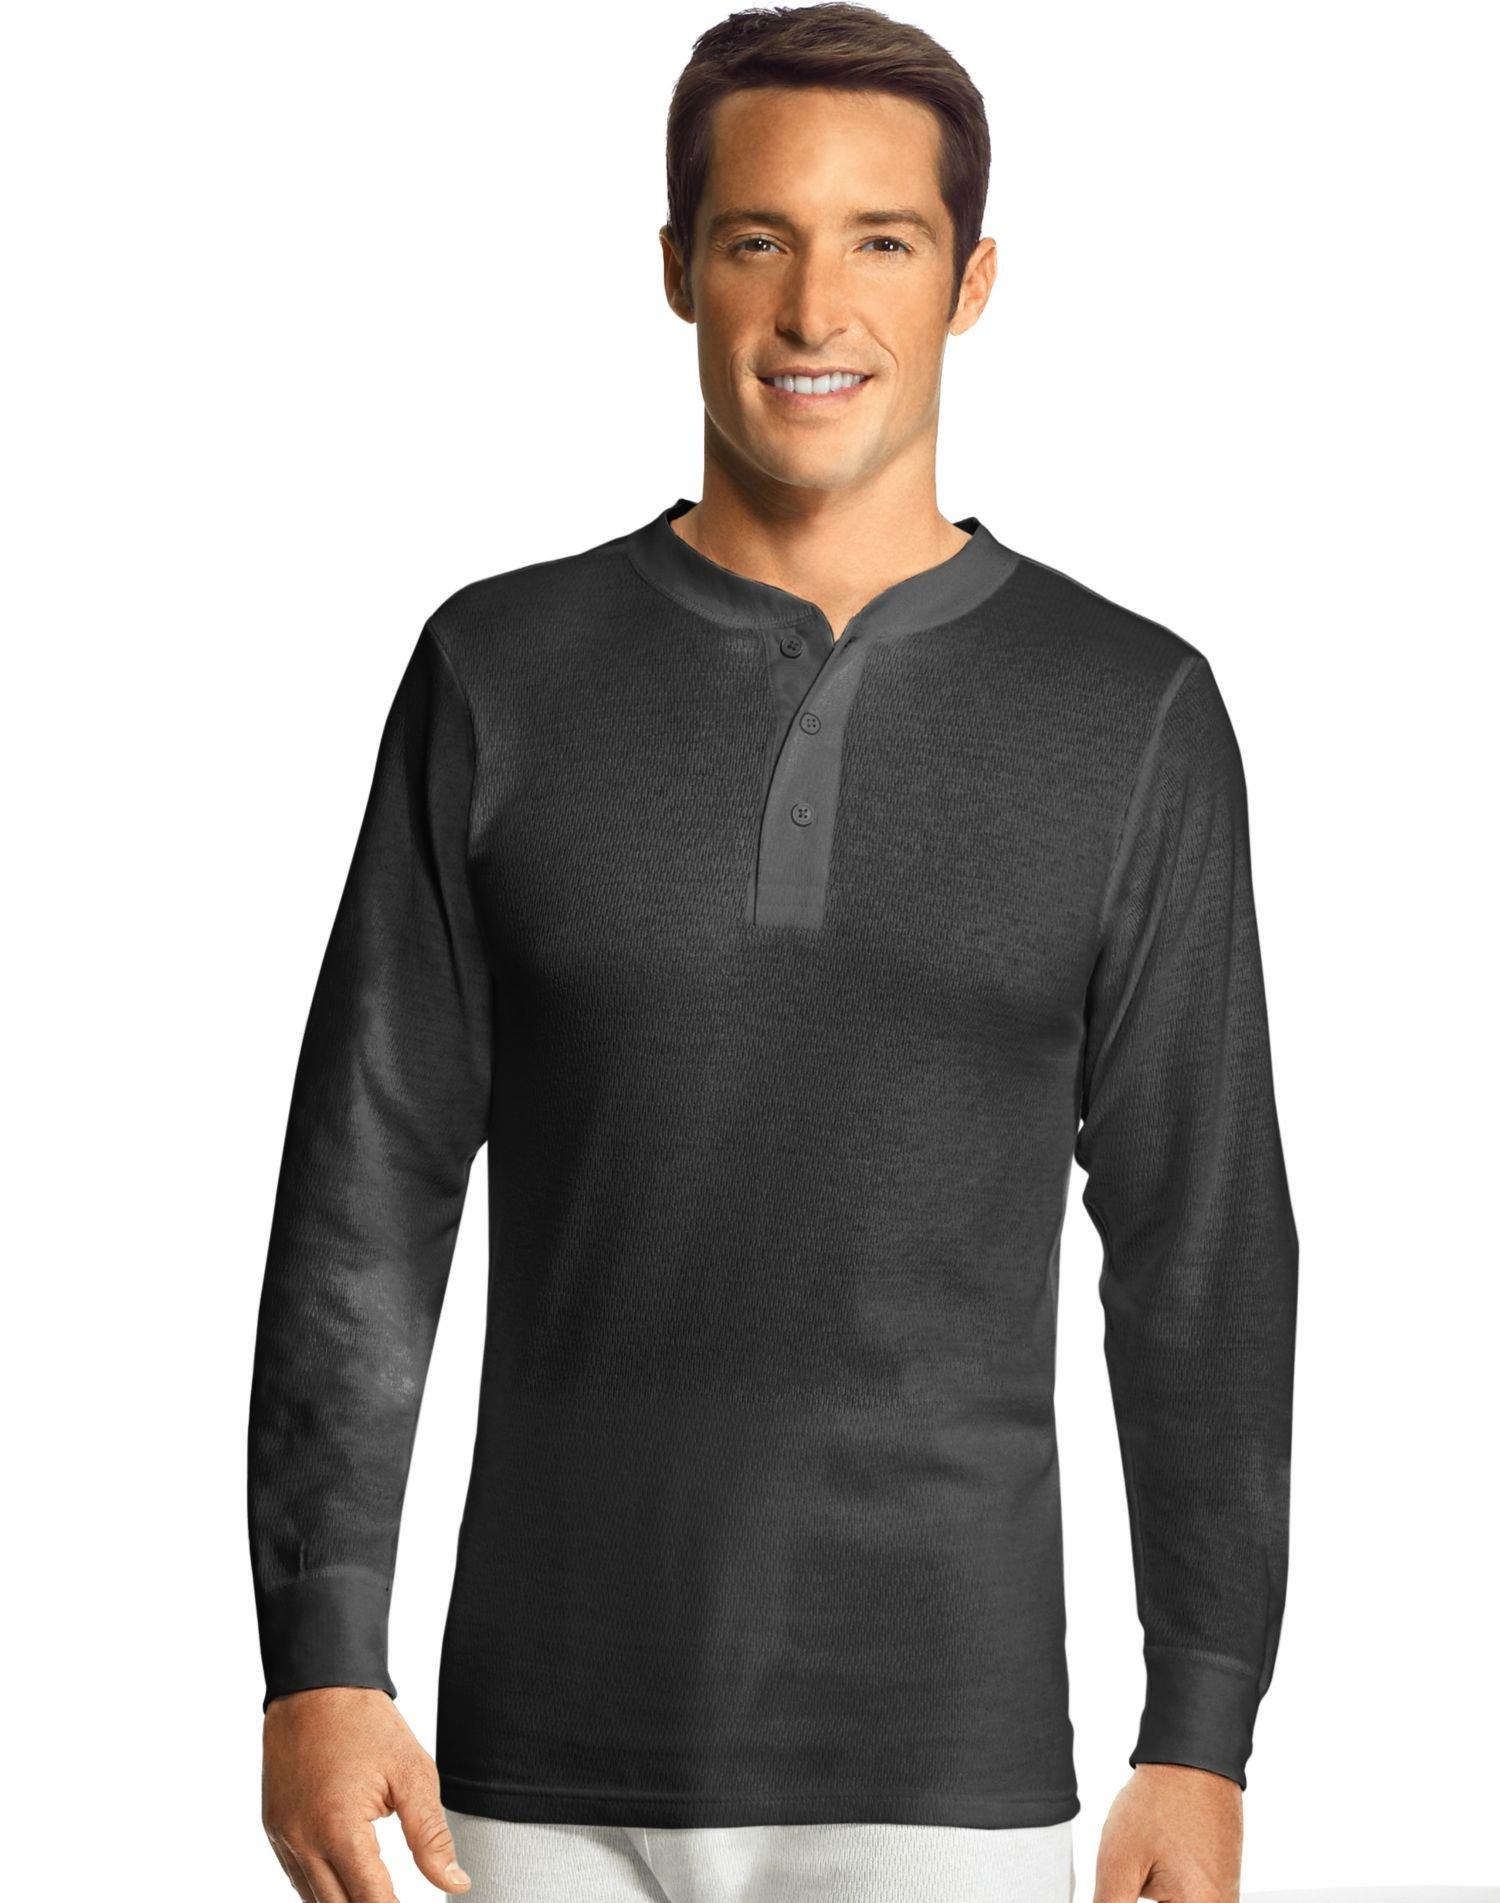 Hanes Men's X-Temp Thermal Longsleeve Henley Top, Black, X-Large